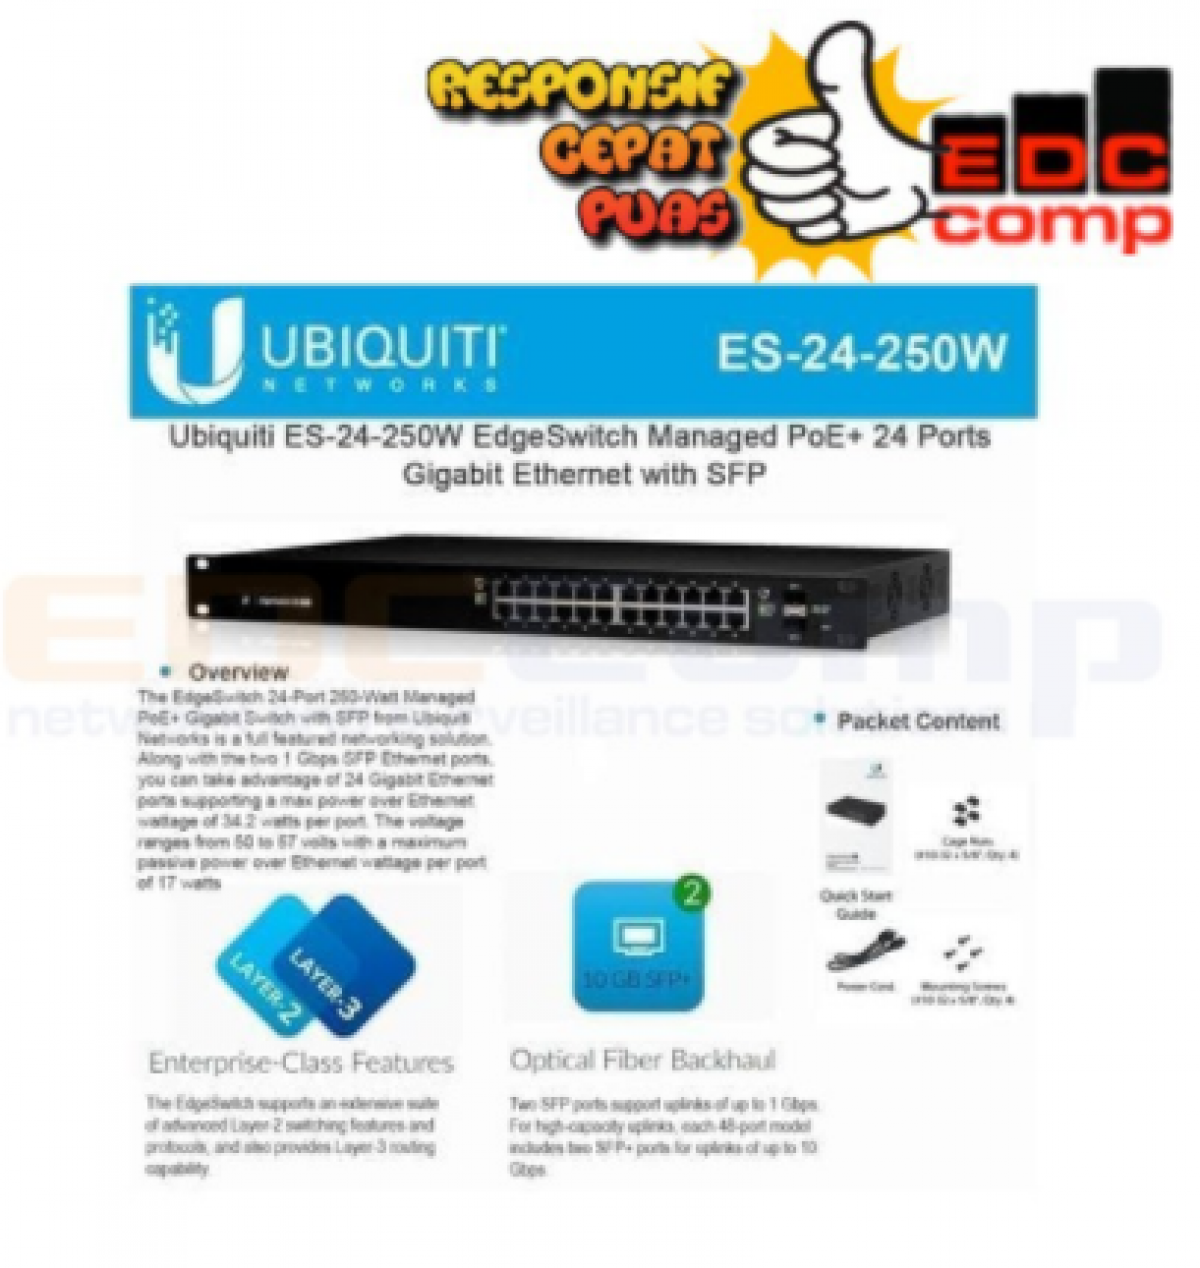 EdgeSwitch 24Port Gigabit Poe ES-24-250W - EdcComp